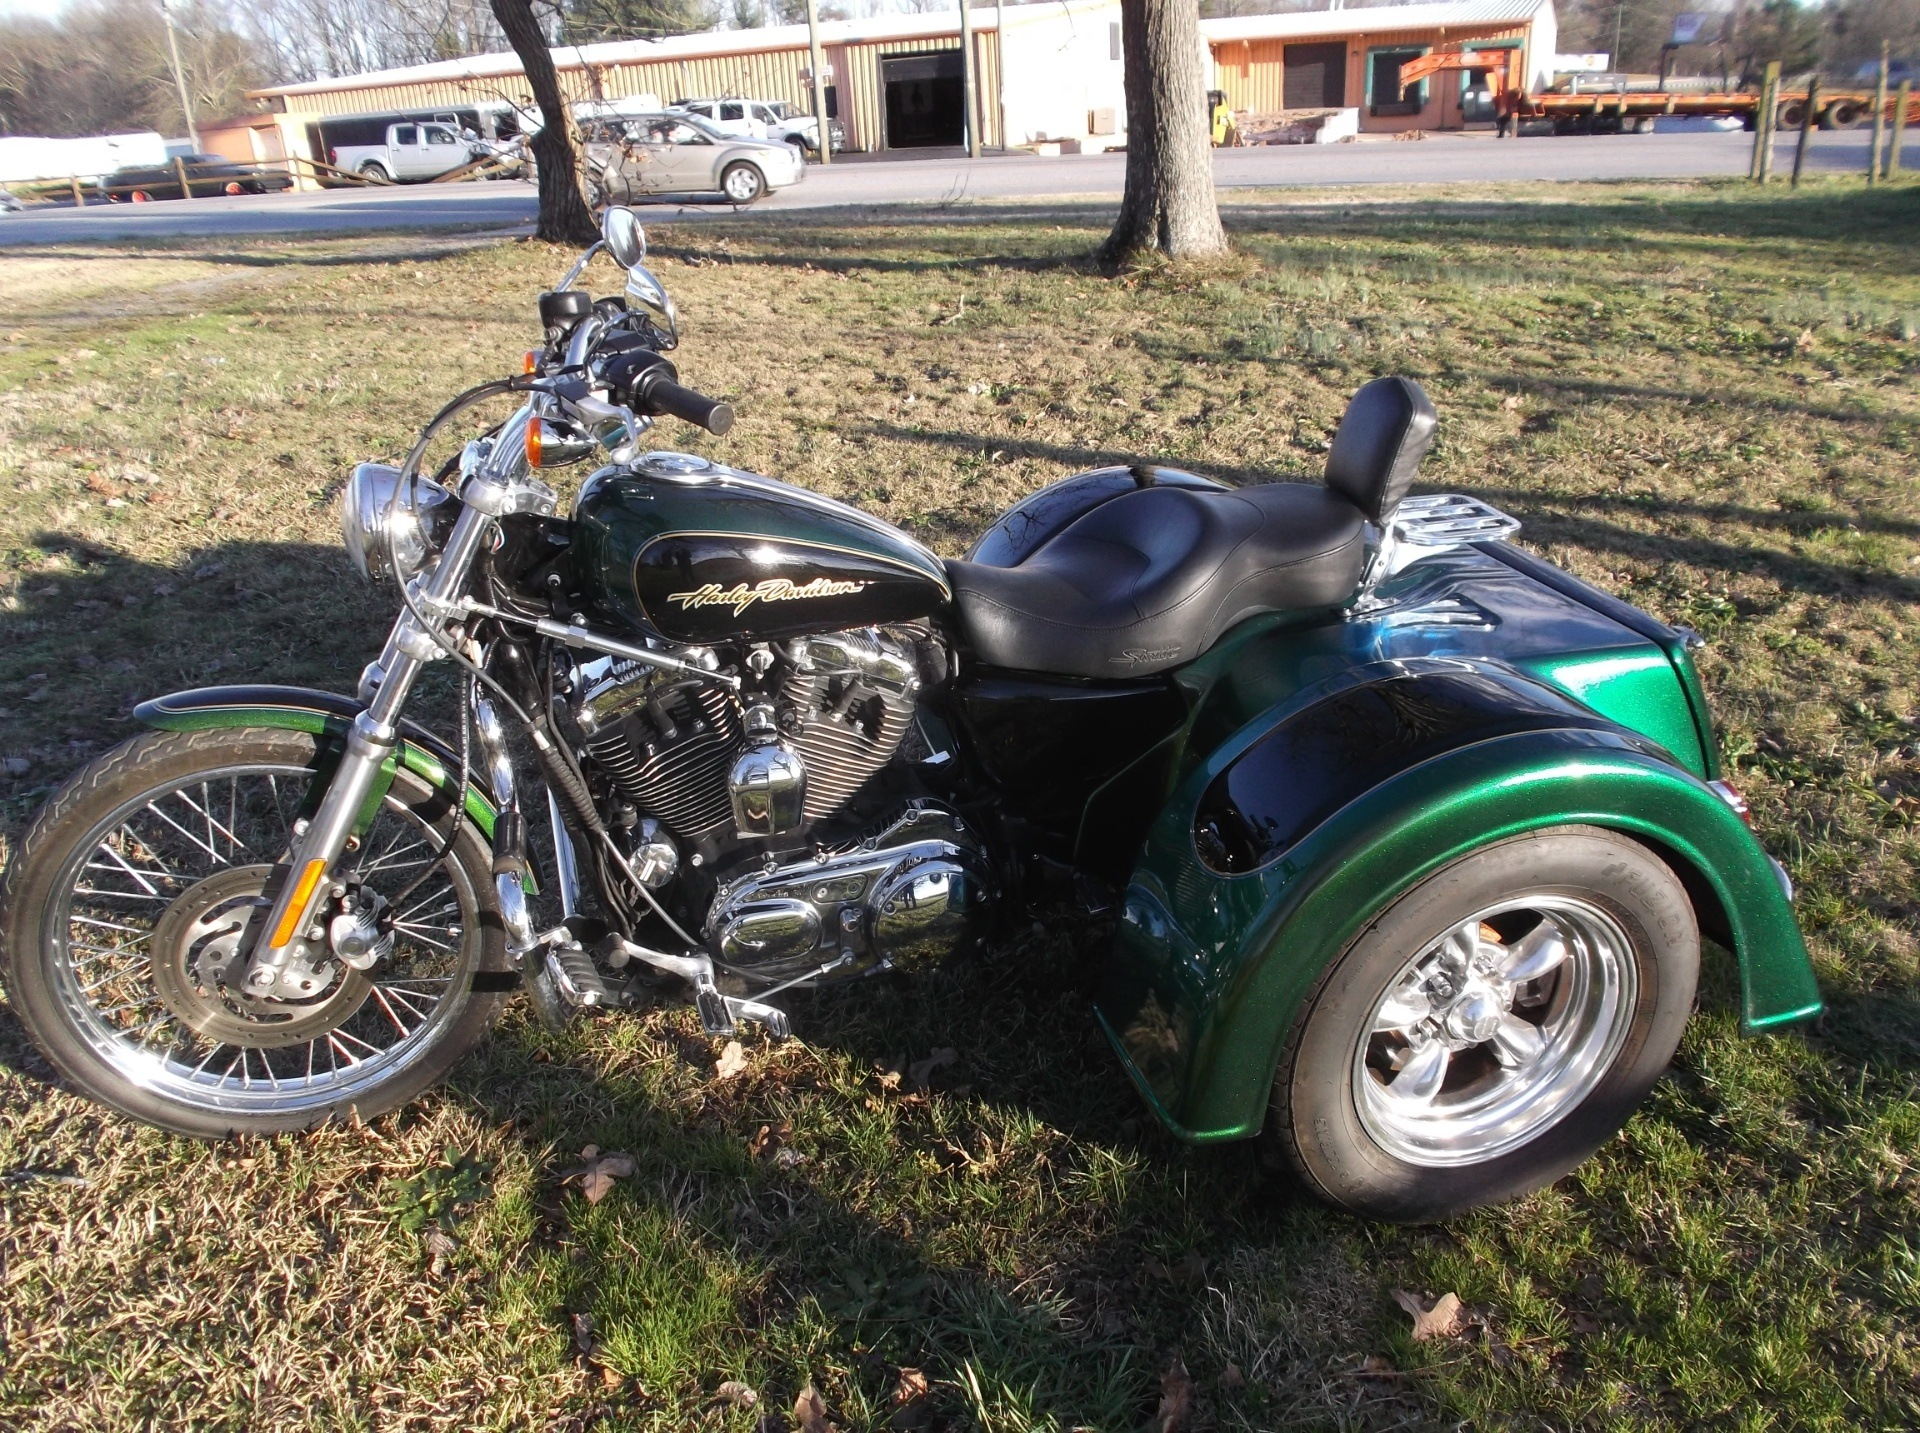 2006 Harley-Davidson XL1200 MOTORTRIKE 12